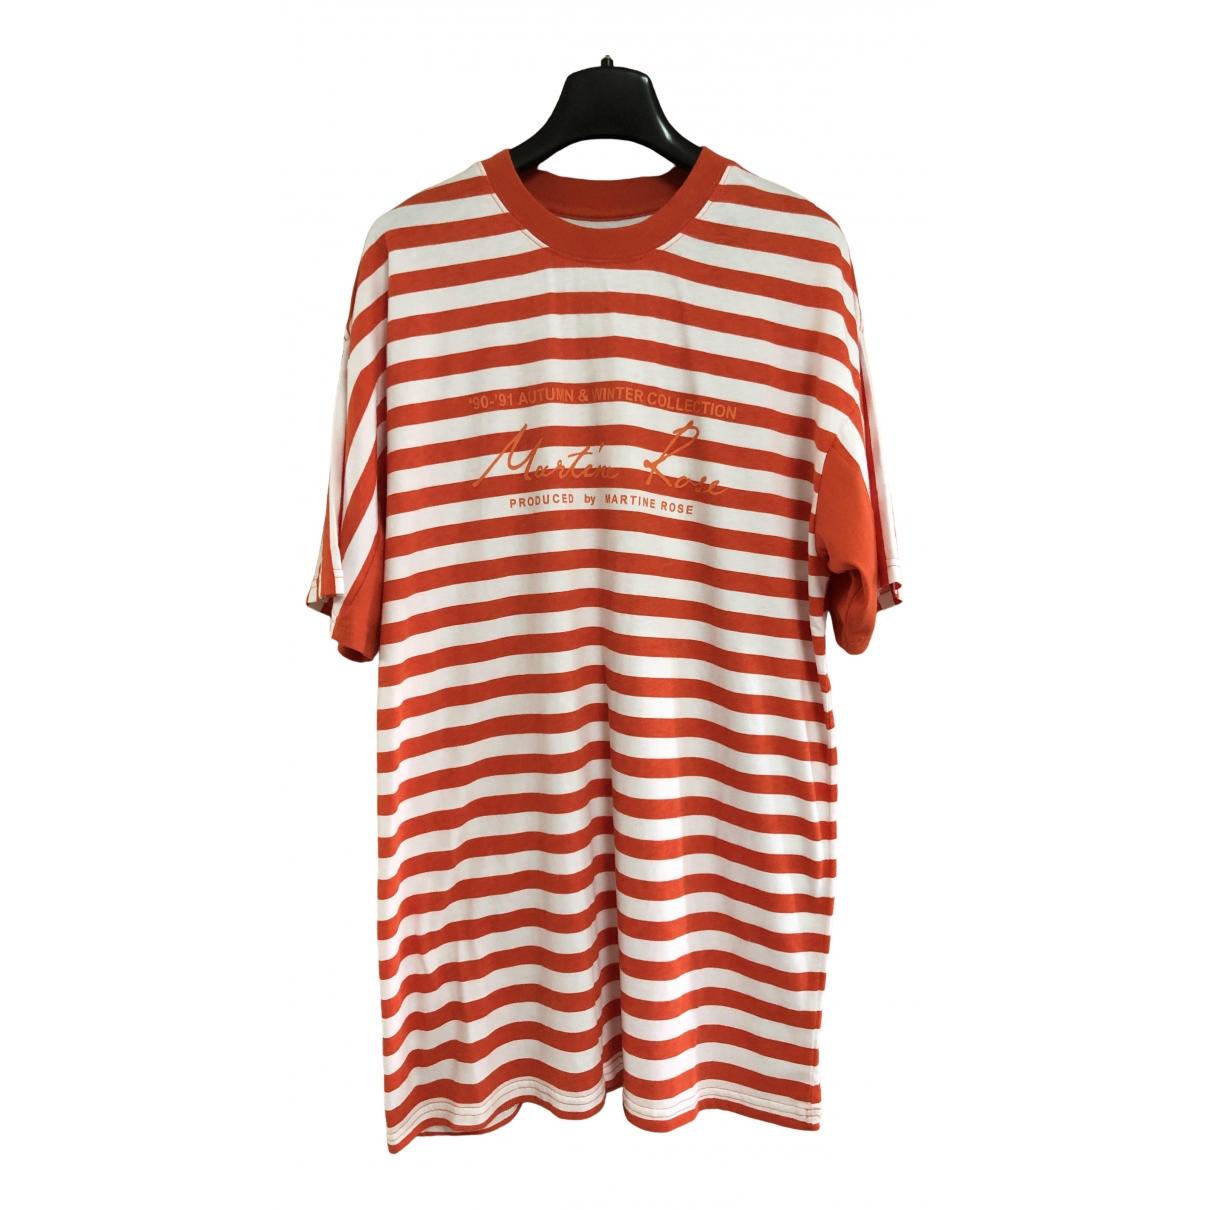 Martine Rose \N Orange Cotton T-shirts for Men S International